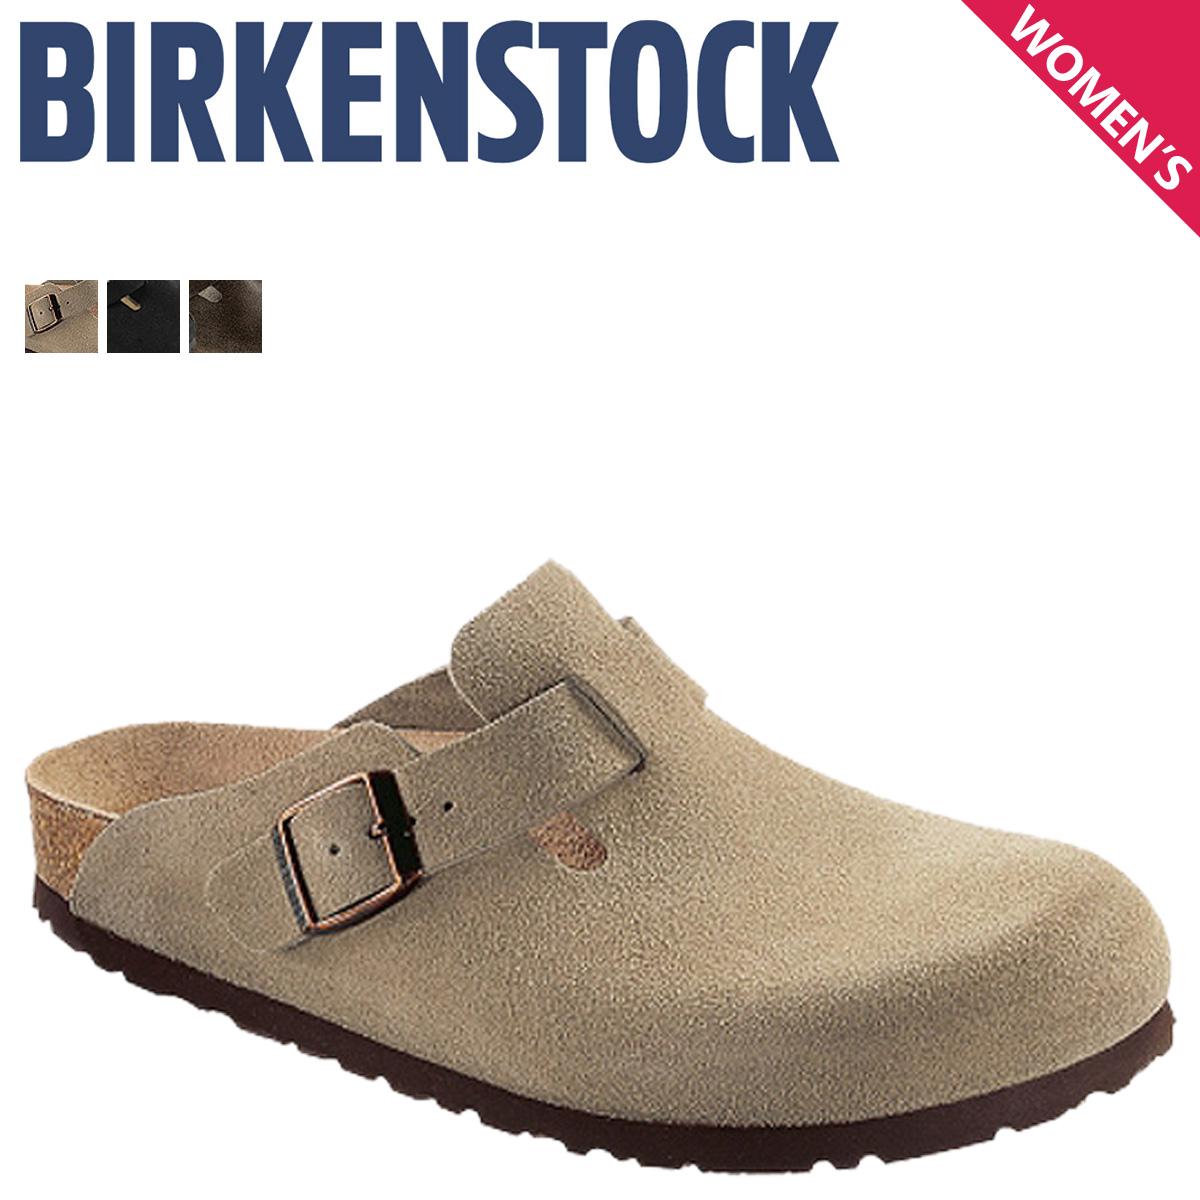 71bb2eda88046 Point 2 x Birkenstock BIRKENSTOCK Boston BOSTON 3 color mens ladies Sandals  02P13Dec13_m